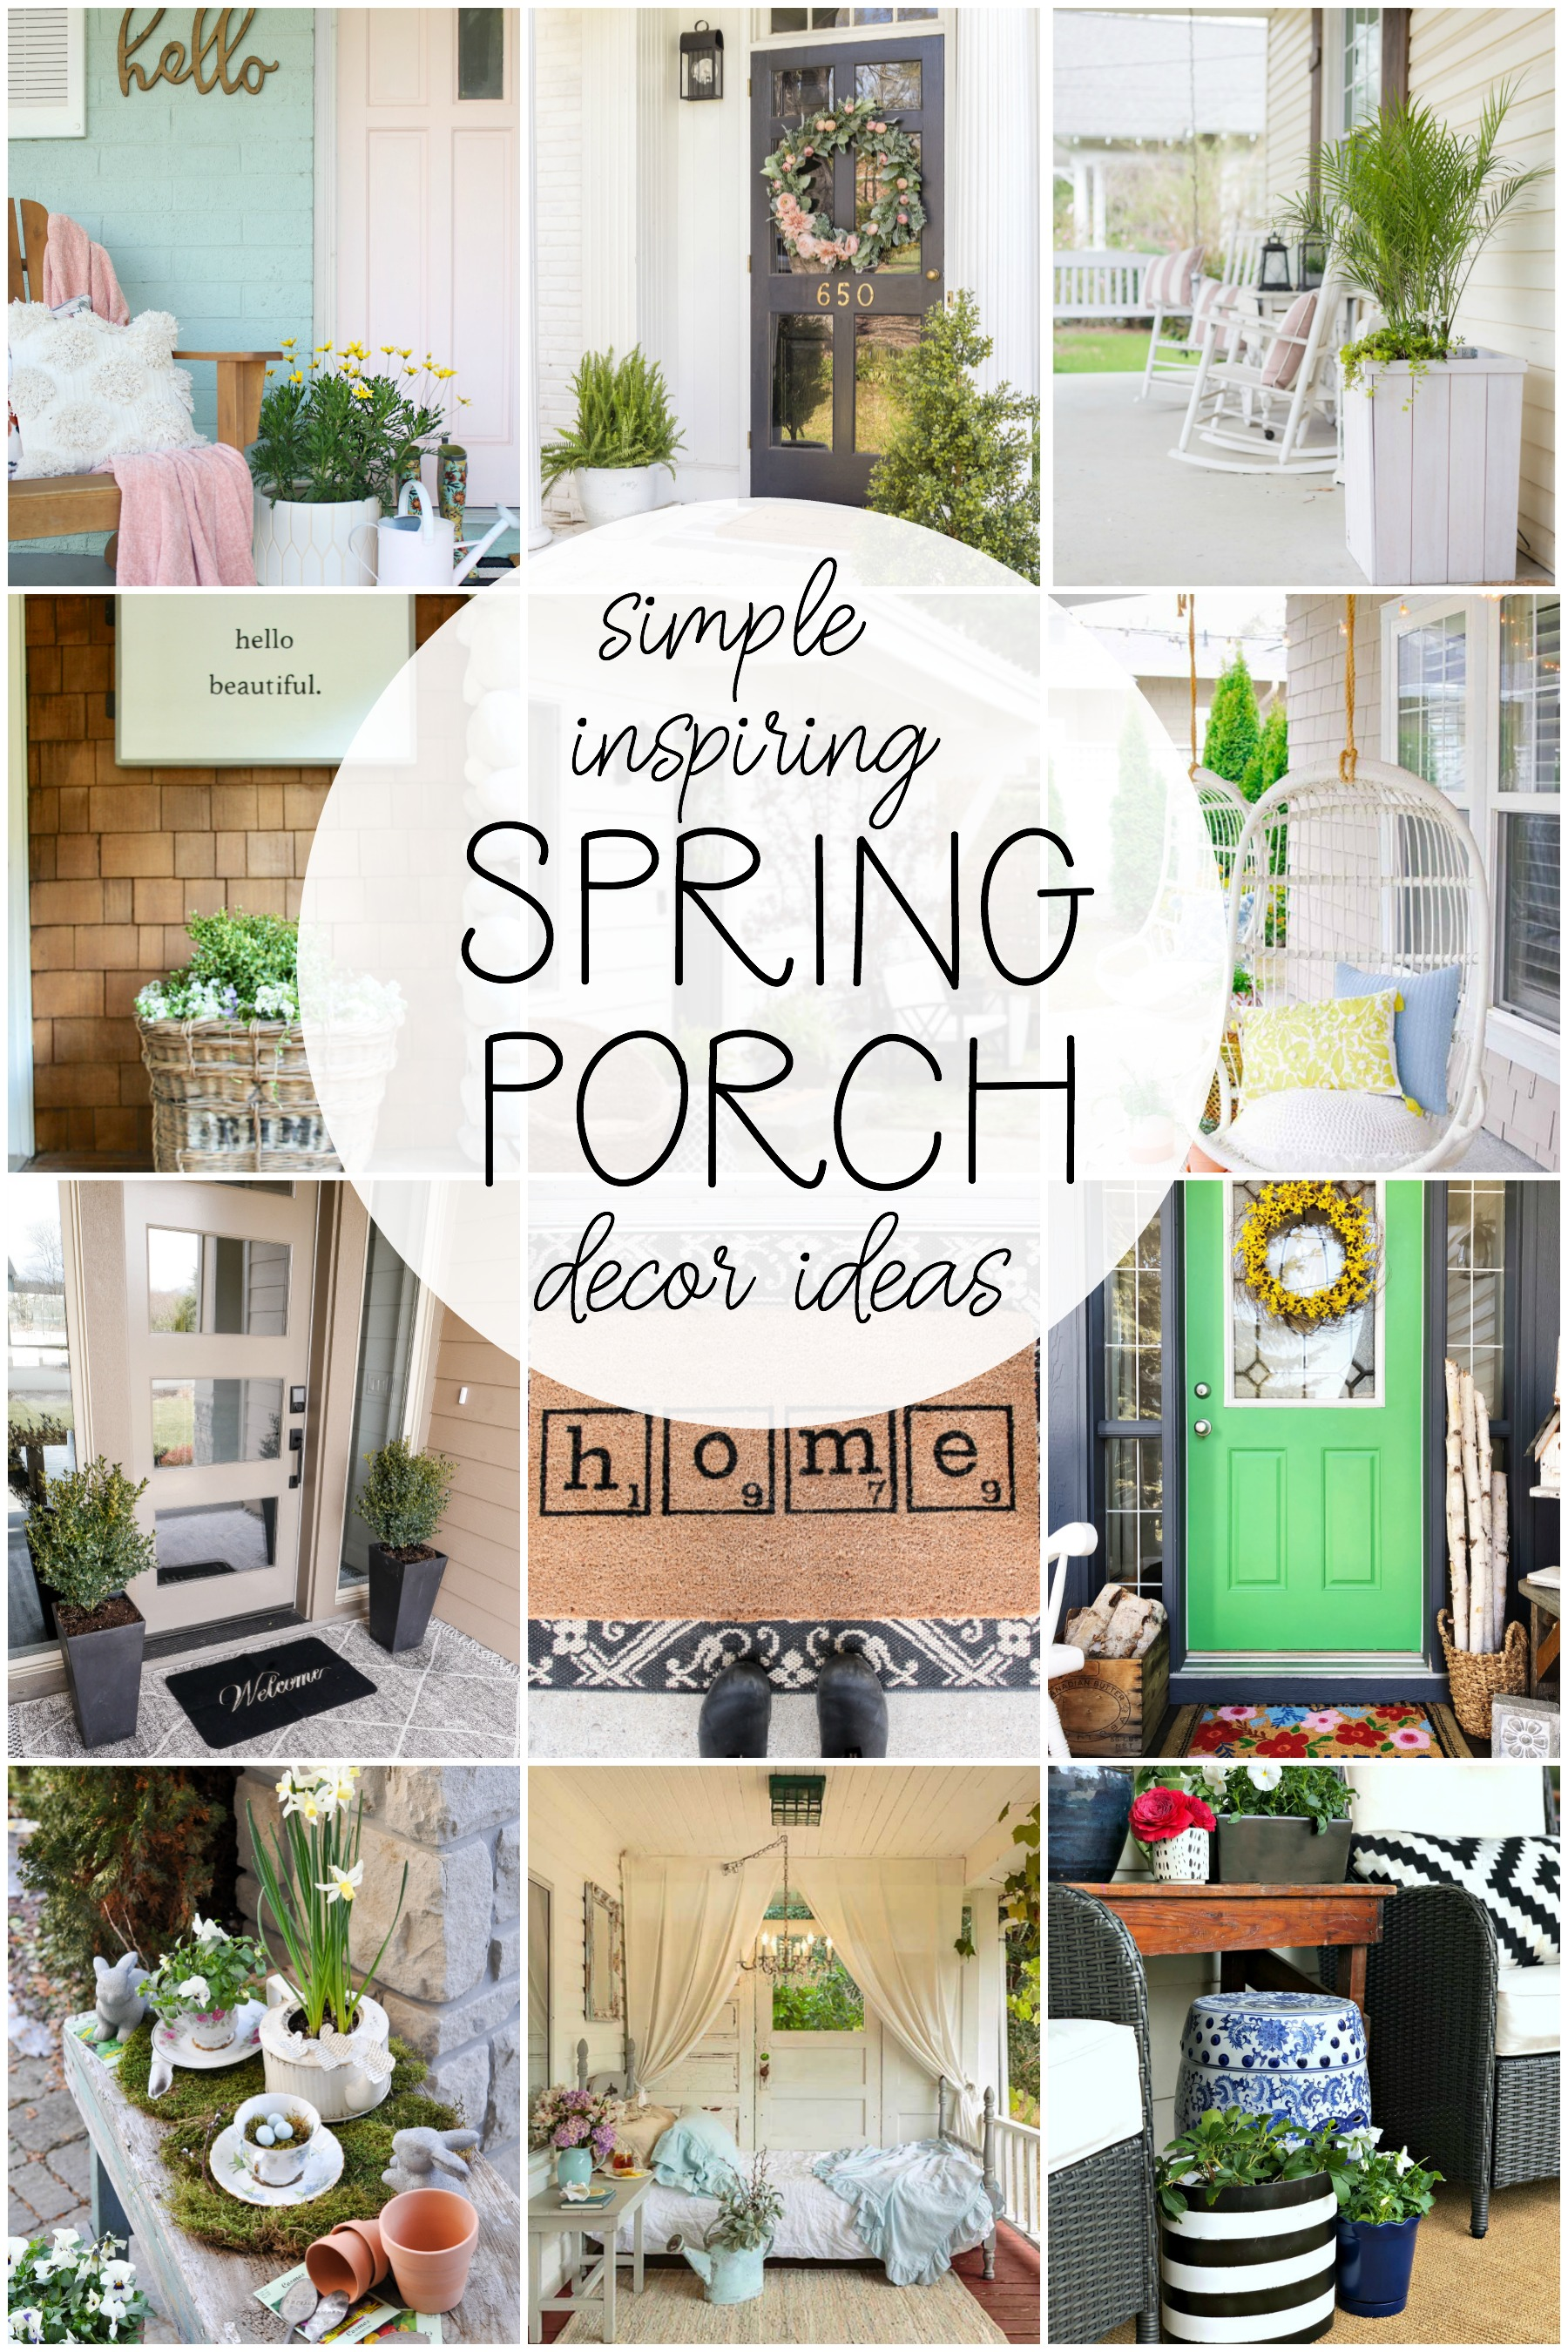 spring porch decor ideas via @modernglamhome